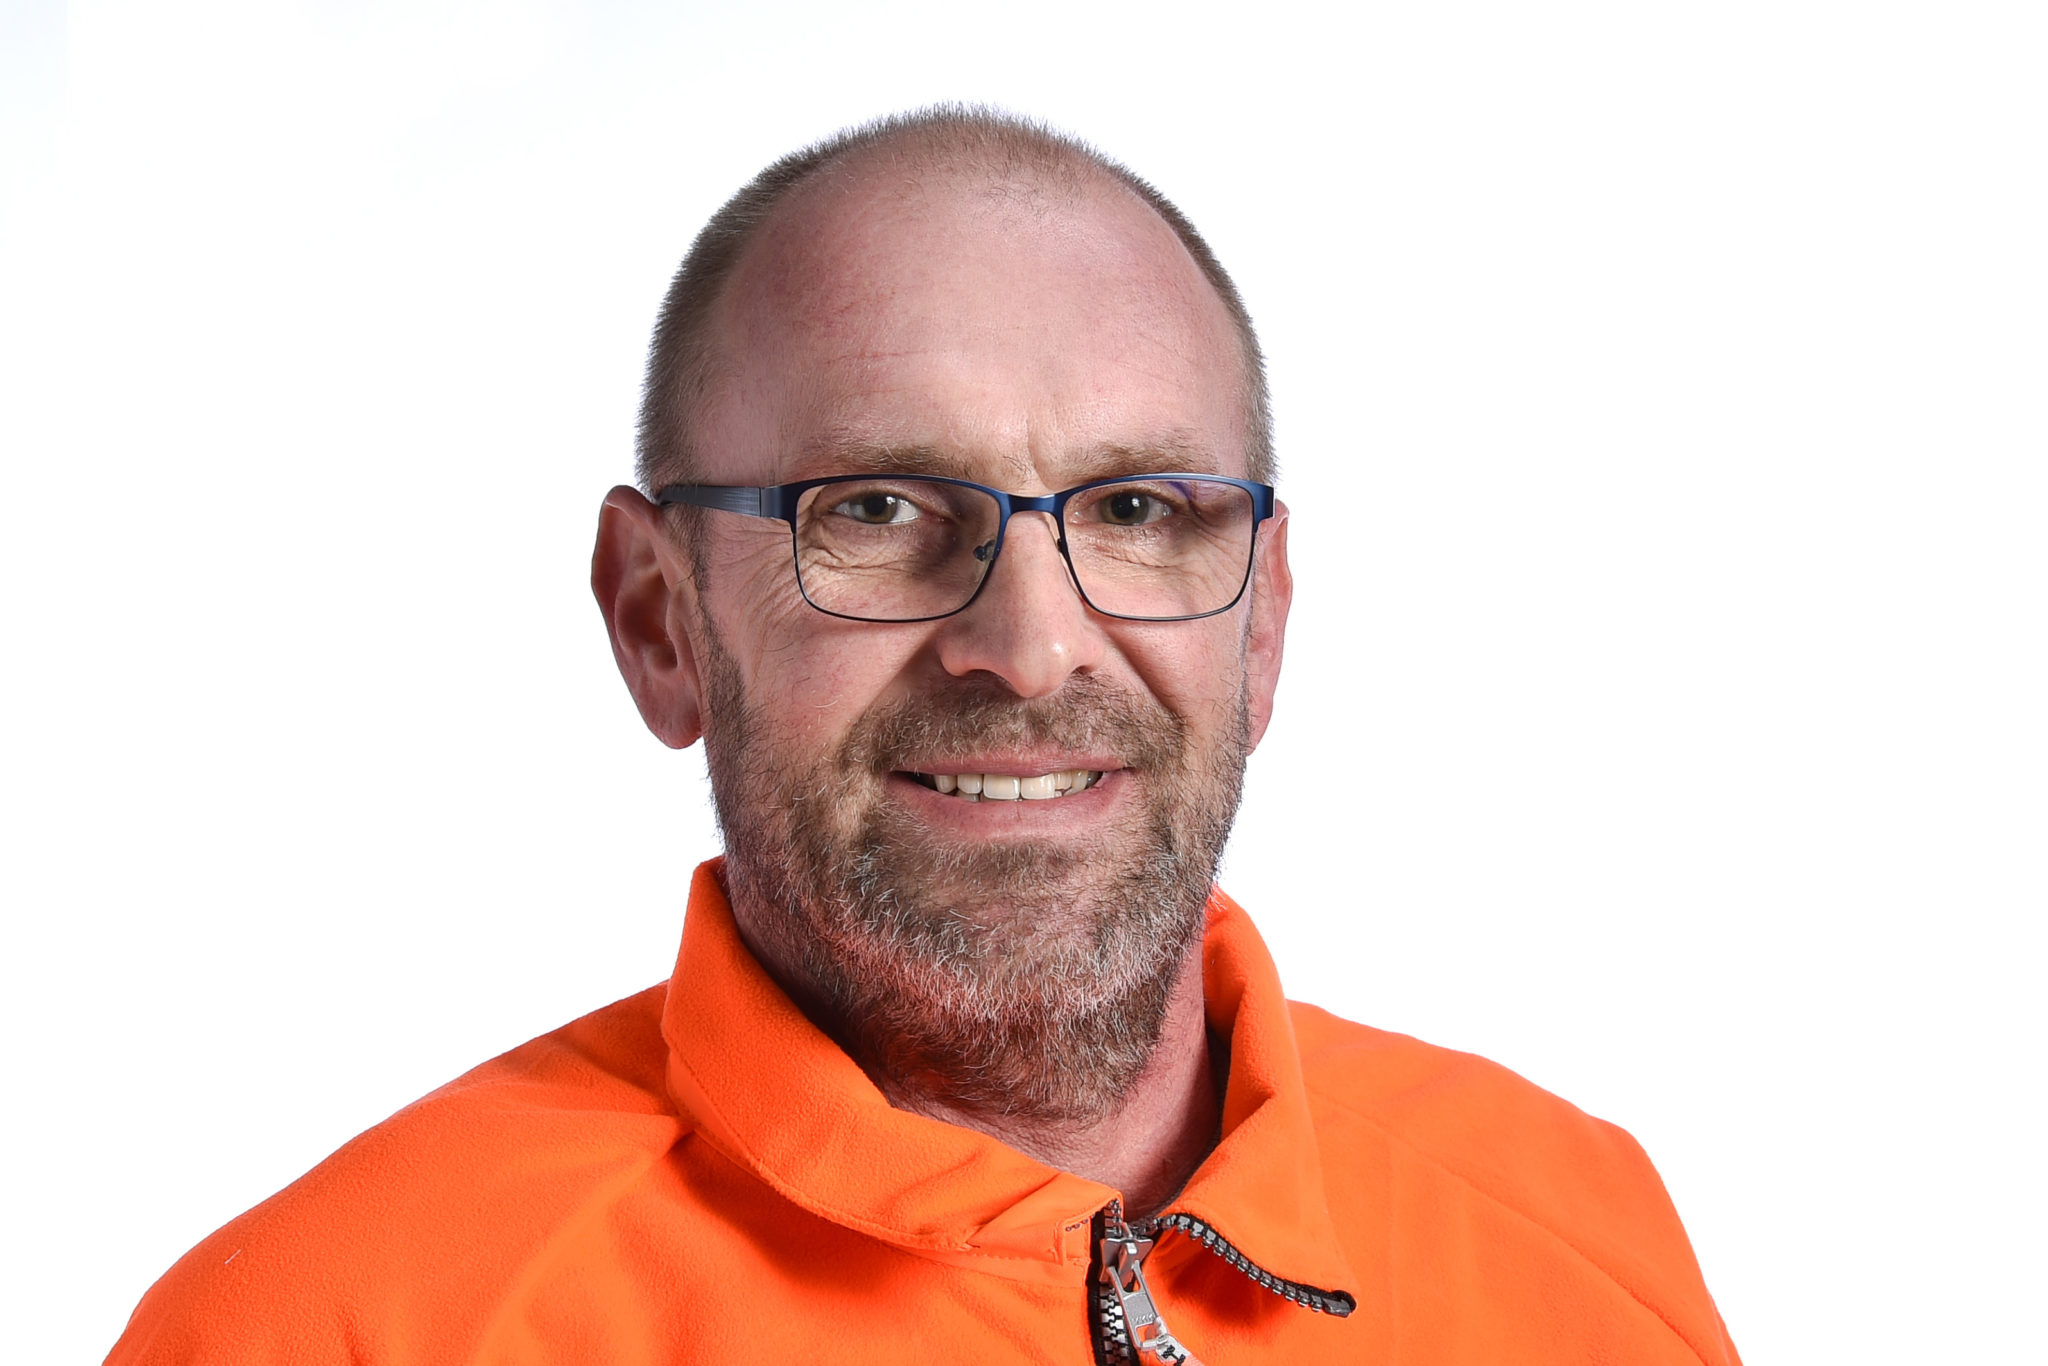 Christian Halschka